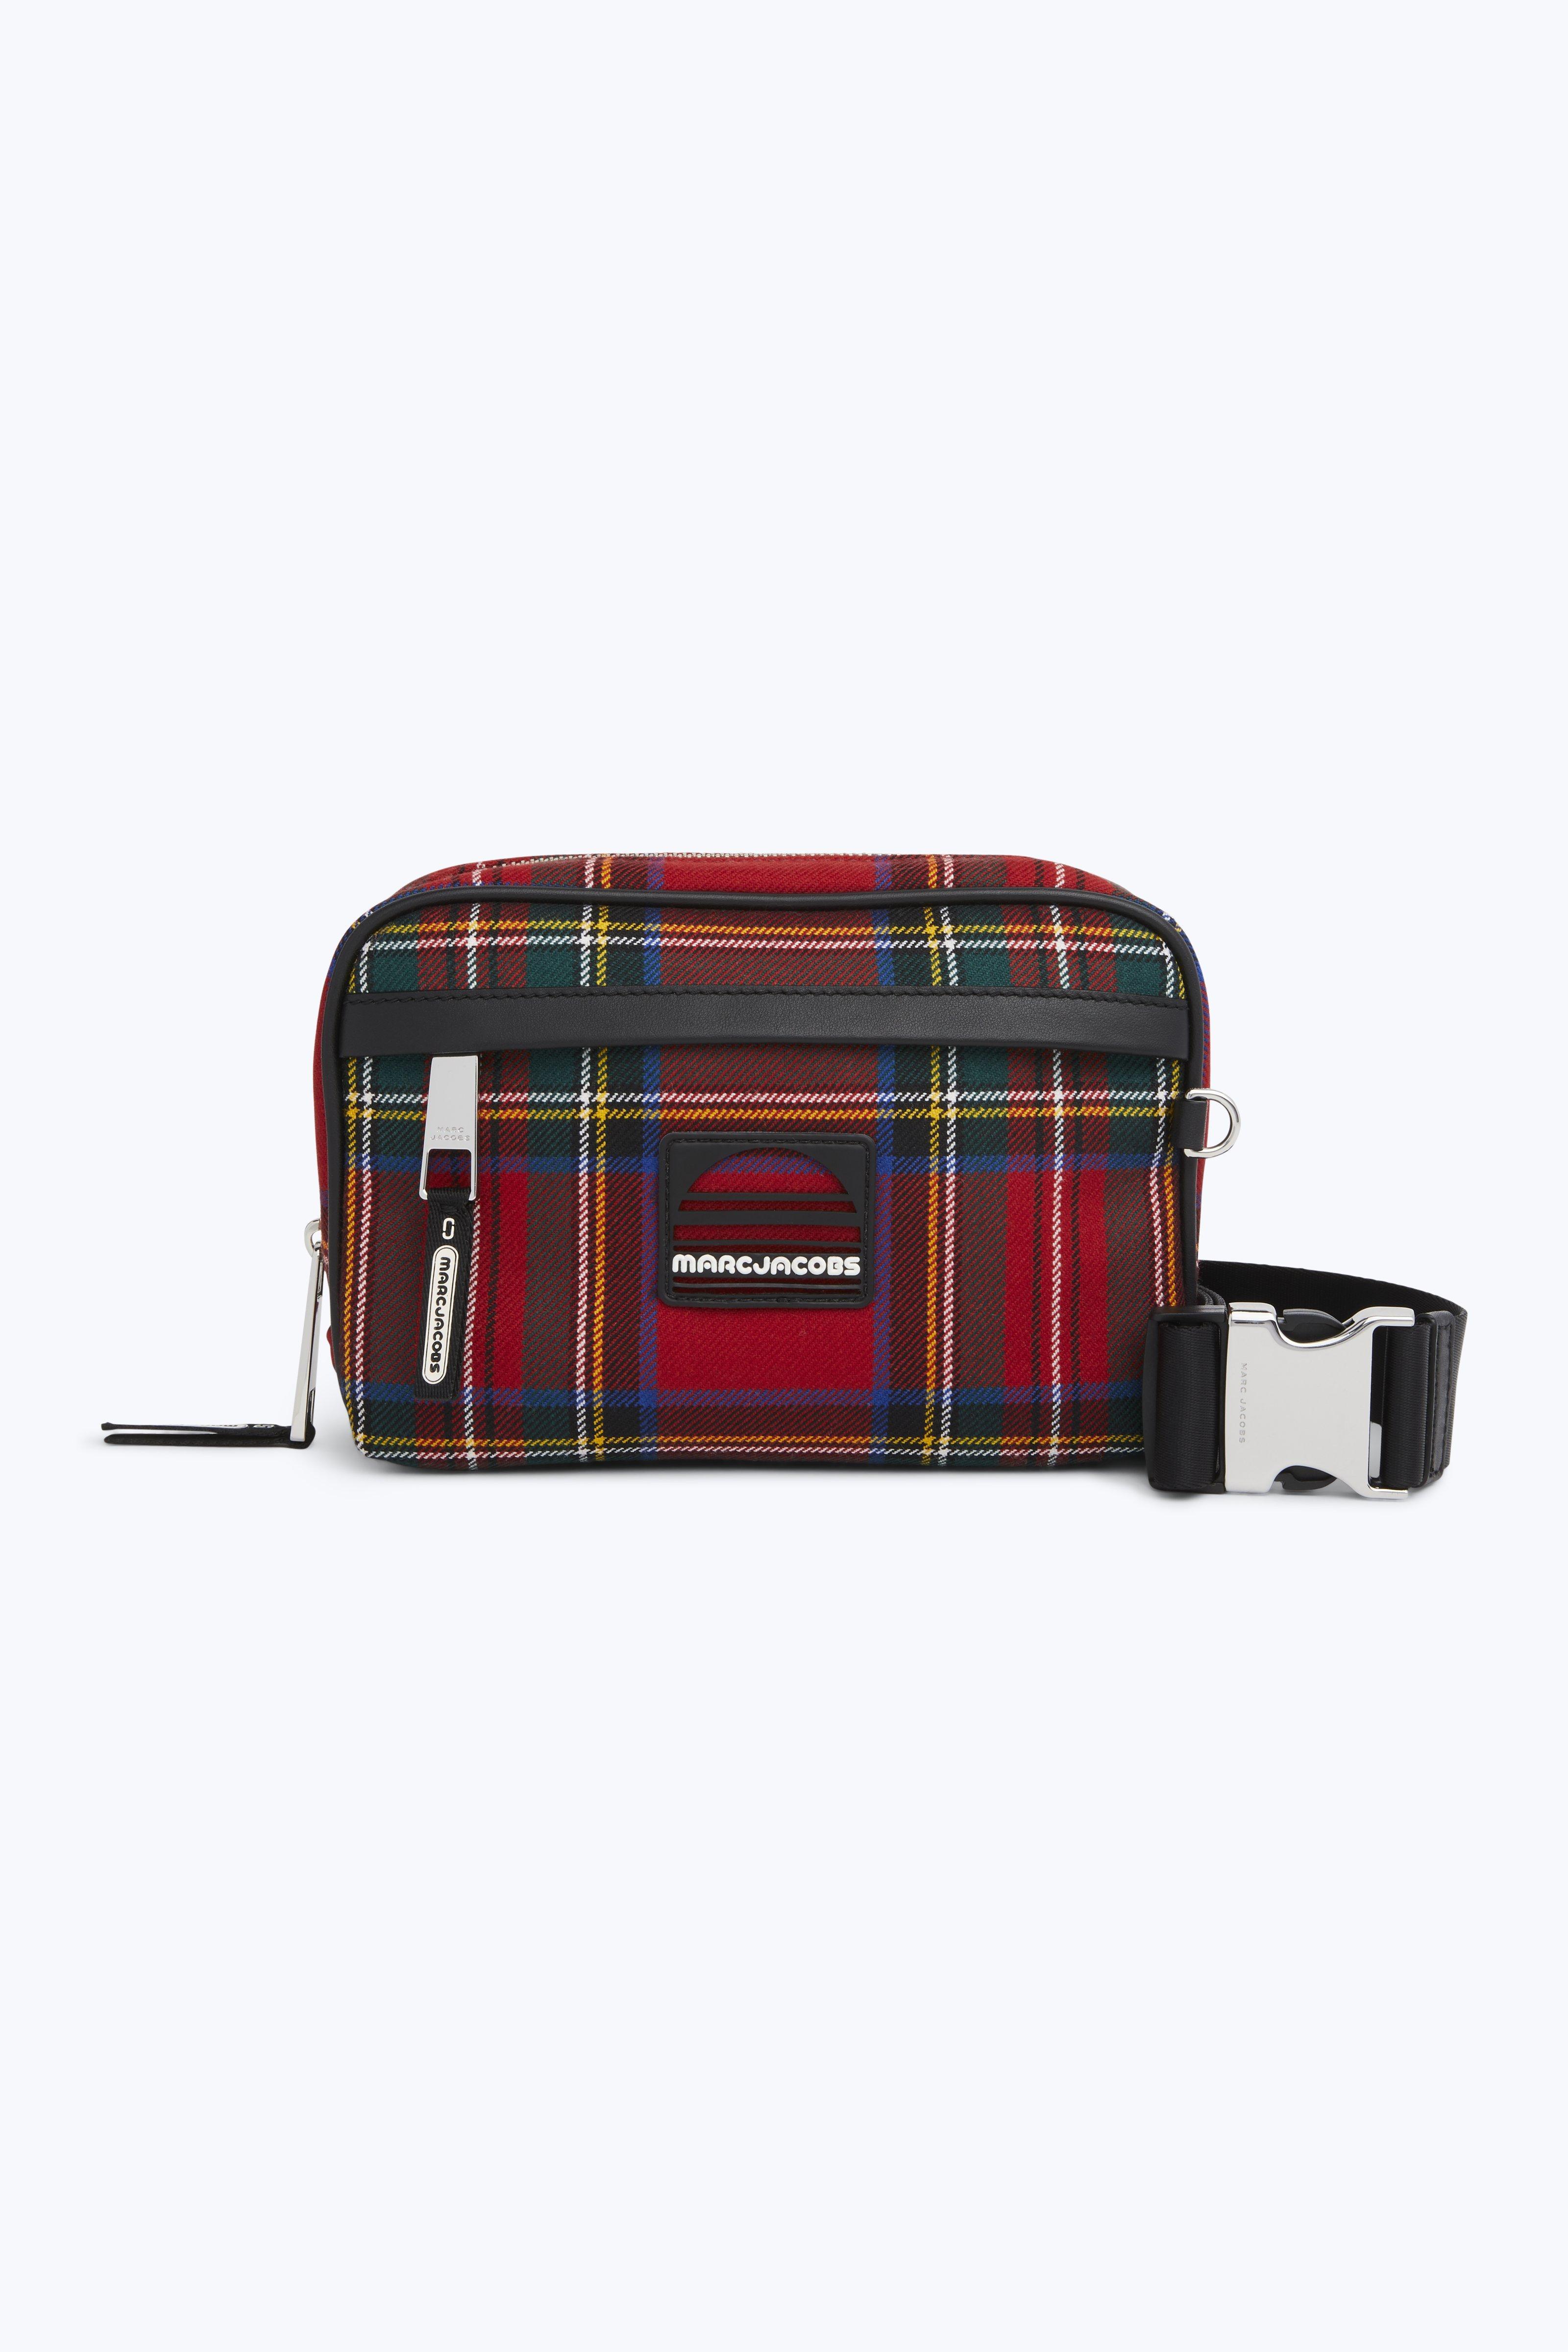 tartan Sport belt bag - Red Marc Jacobs 5p2Vsa